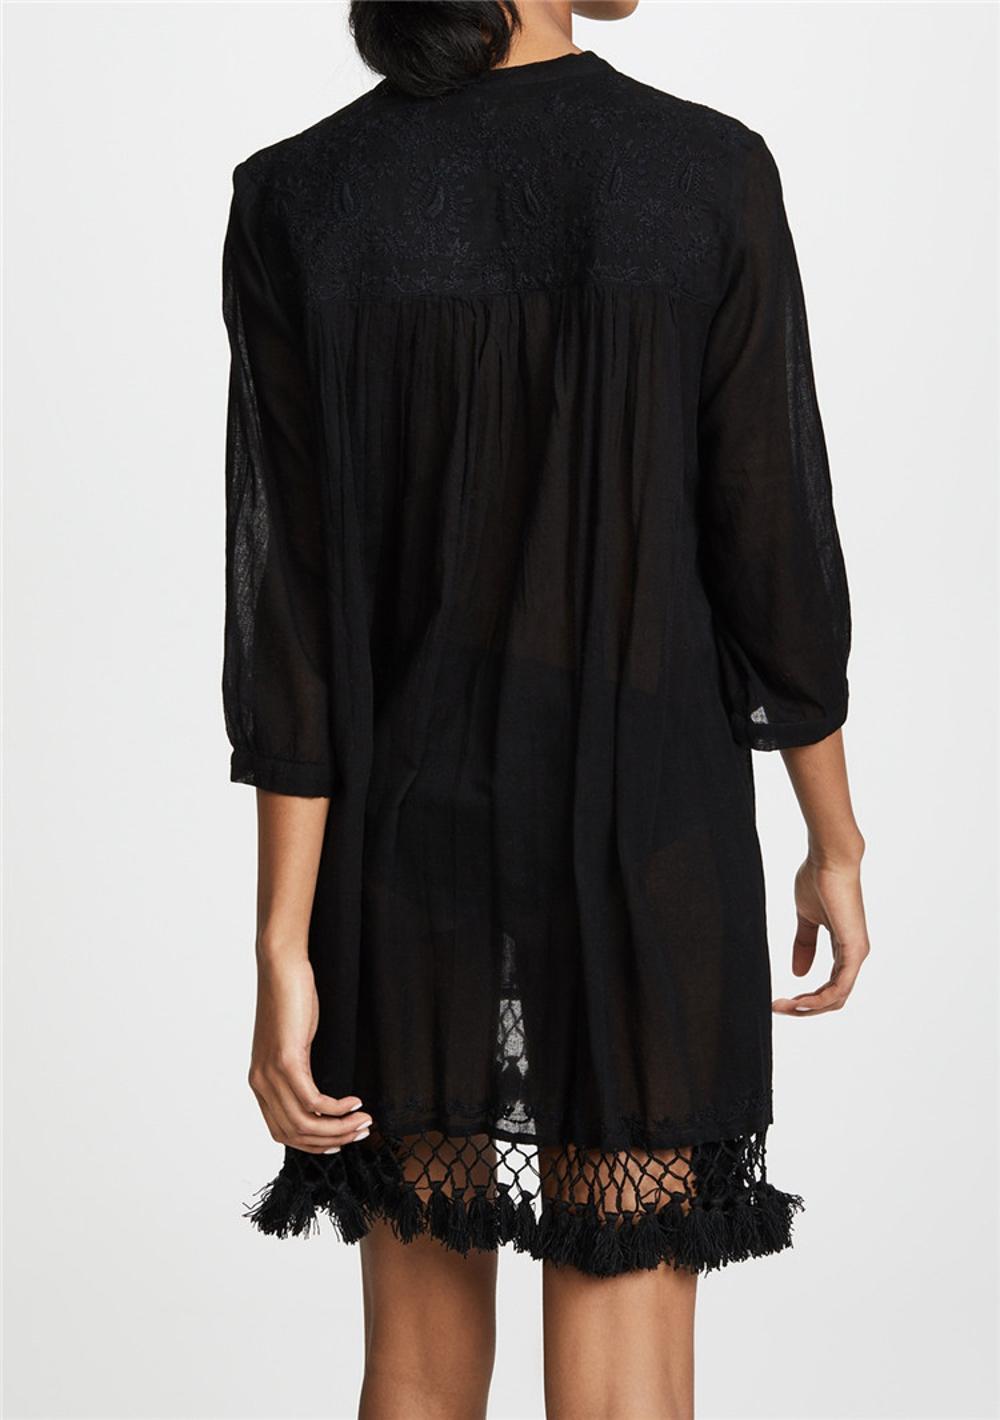 8b3db598ee Women Tassel Tunic Dress. Packaging & Shipping. Women Custom Summer Cotton  Beach Tassel Trim Sheer ...